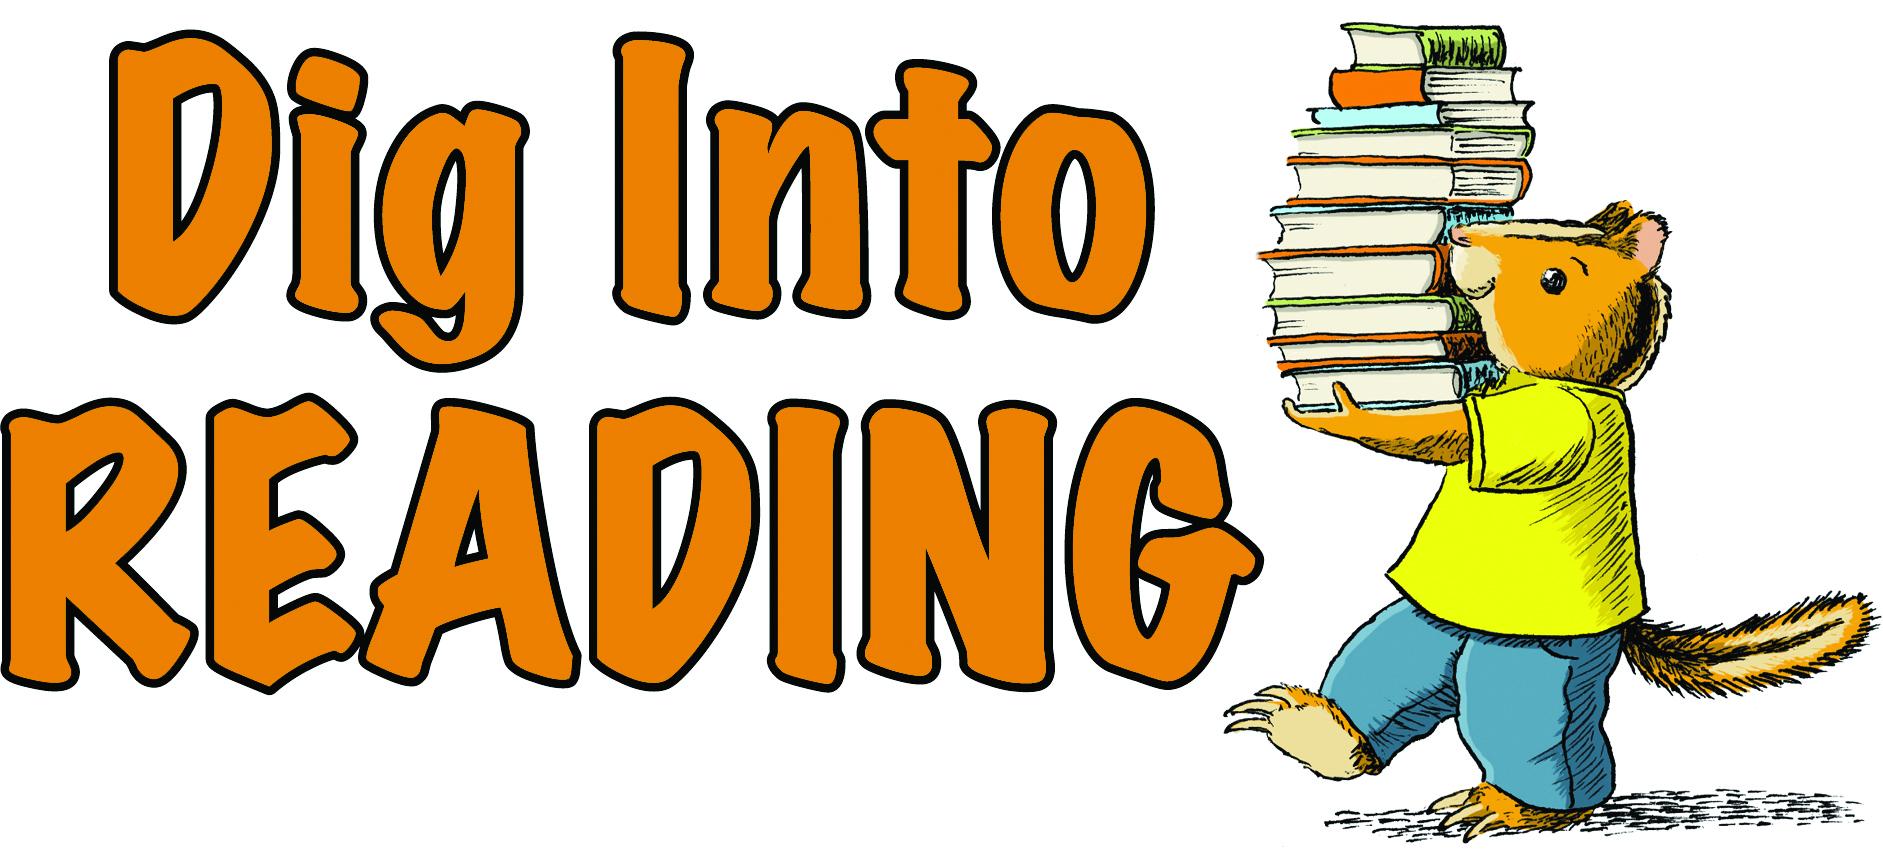 Worksheet Reading Program city and county of broomfield official website summer reading 2013 dig into slogan jpg program